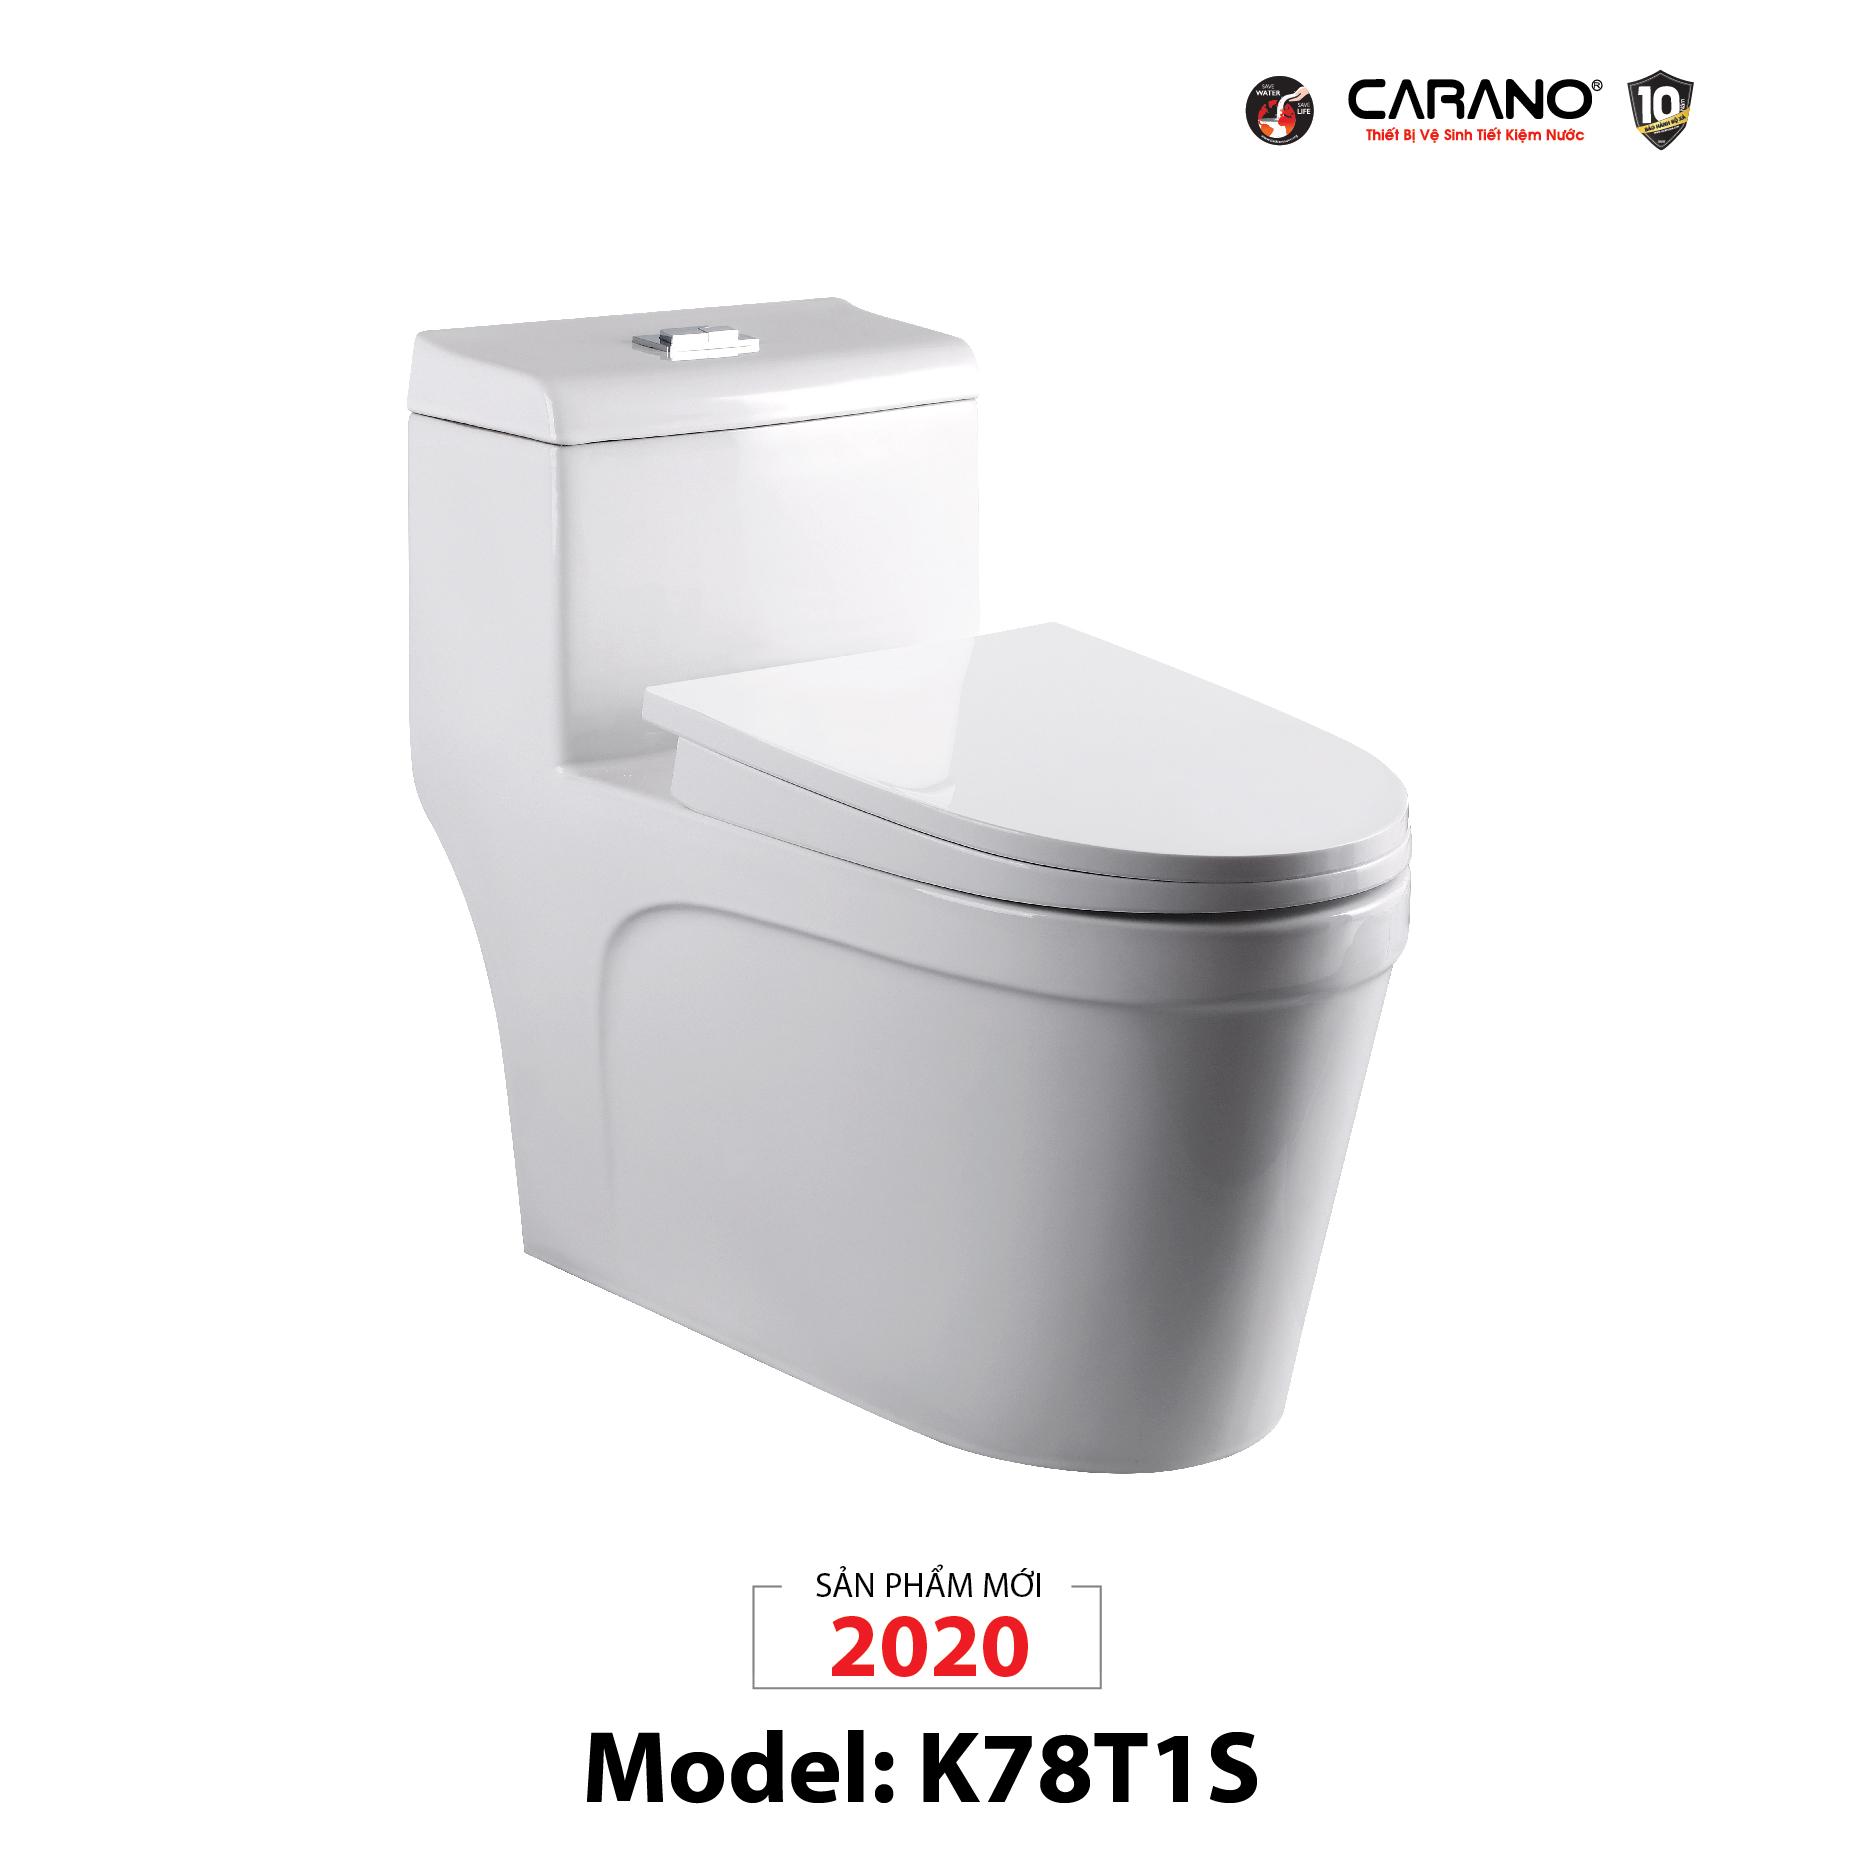 BỒN CẦU CARANO 1 KHỐI K78T1S (TOILET MODEL: K78T1S)